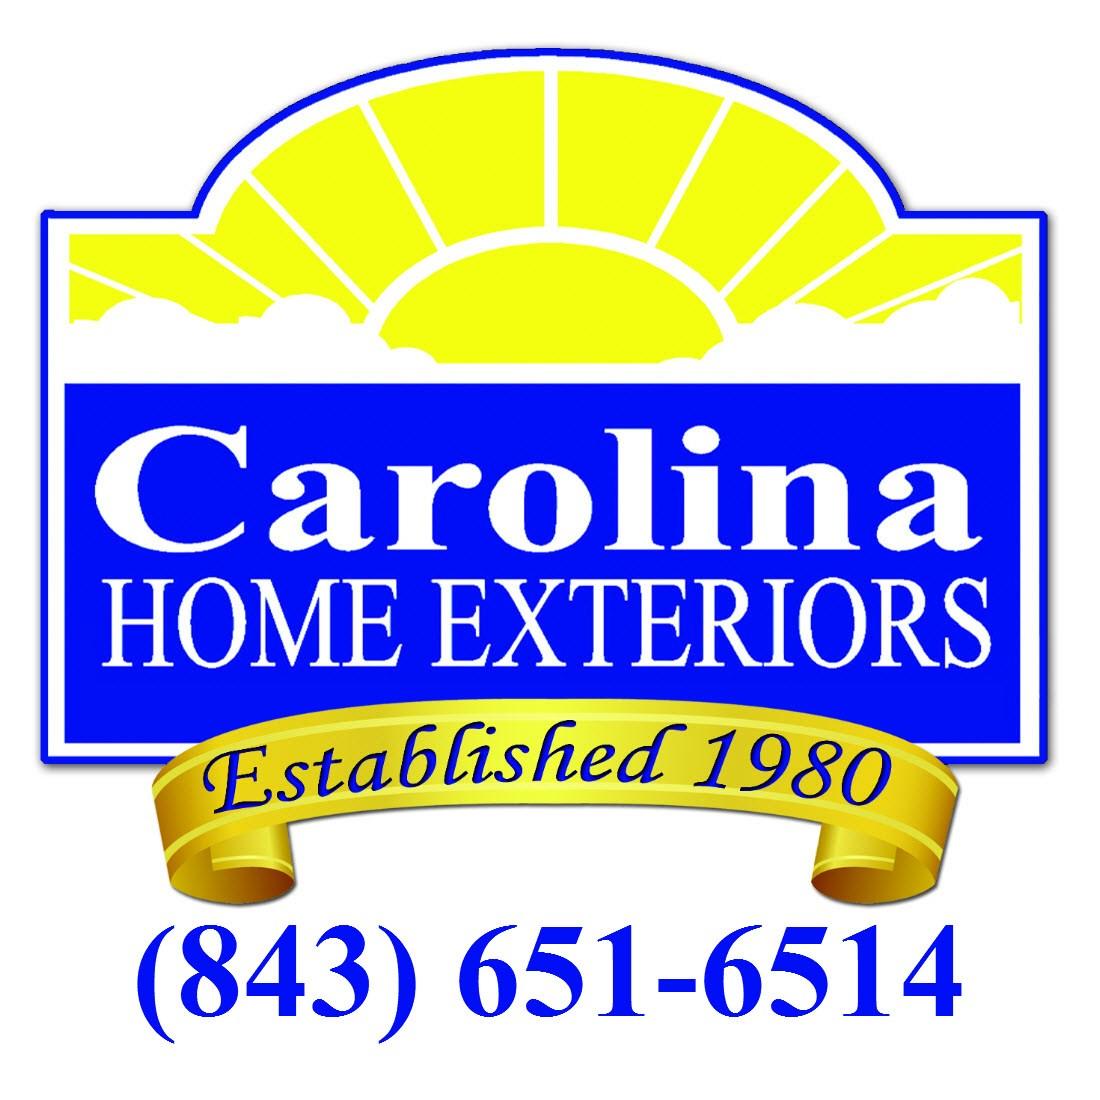 Carolina Home Exteriors: Carolina Home Exteriors Myrtle Beach Sunrooms Reviews